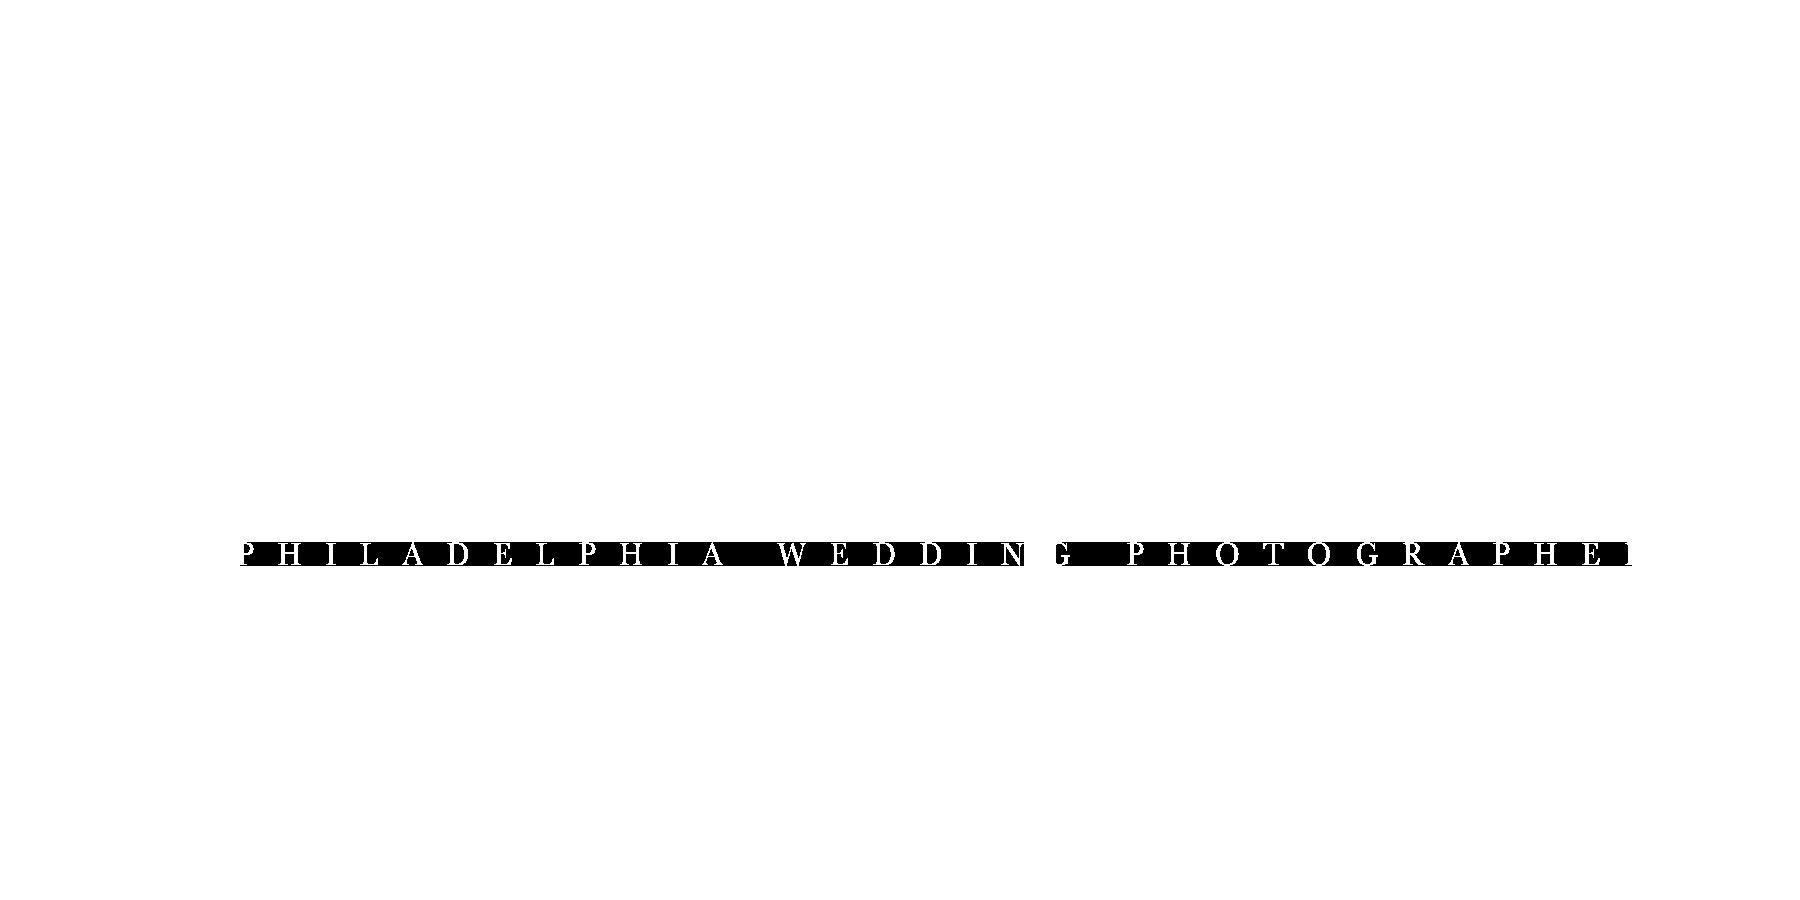 Philadelphia Wedding Photographer, Matt Genders Photography